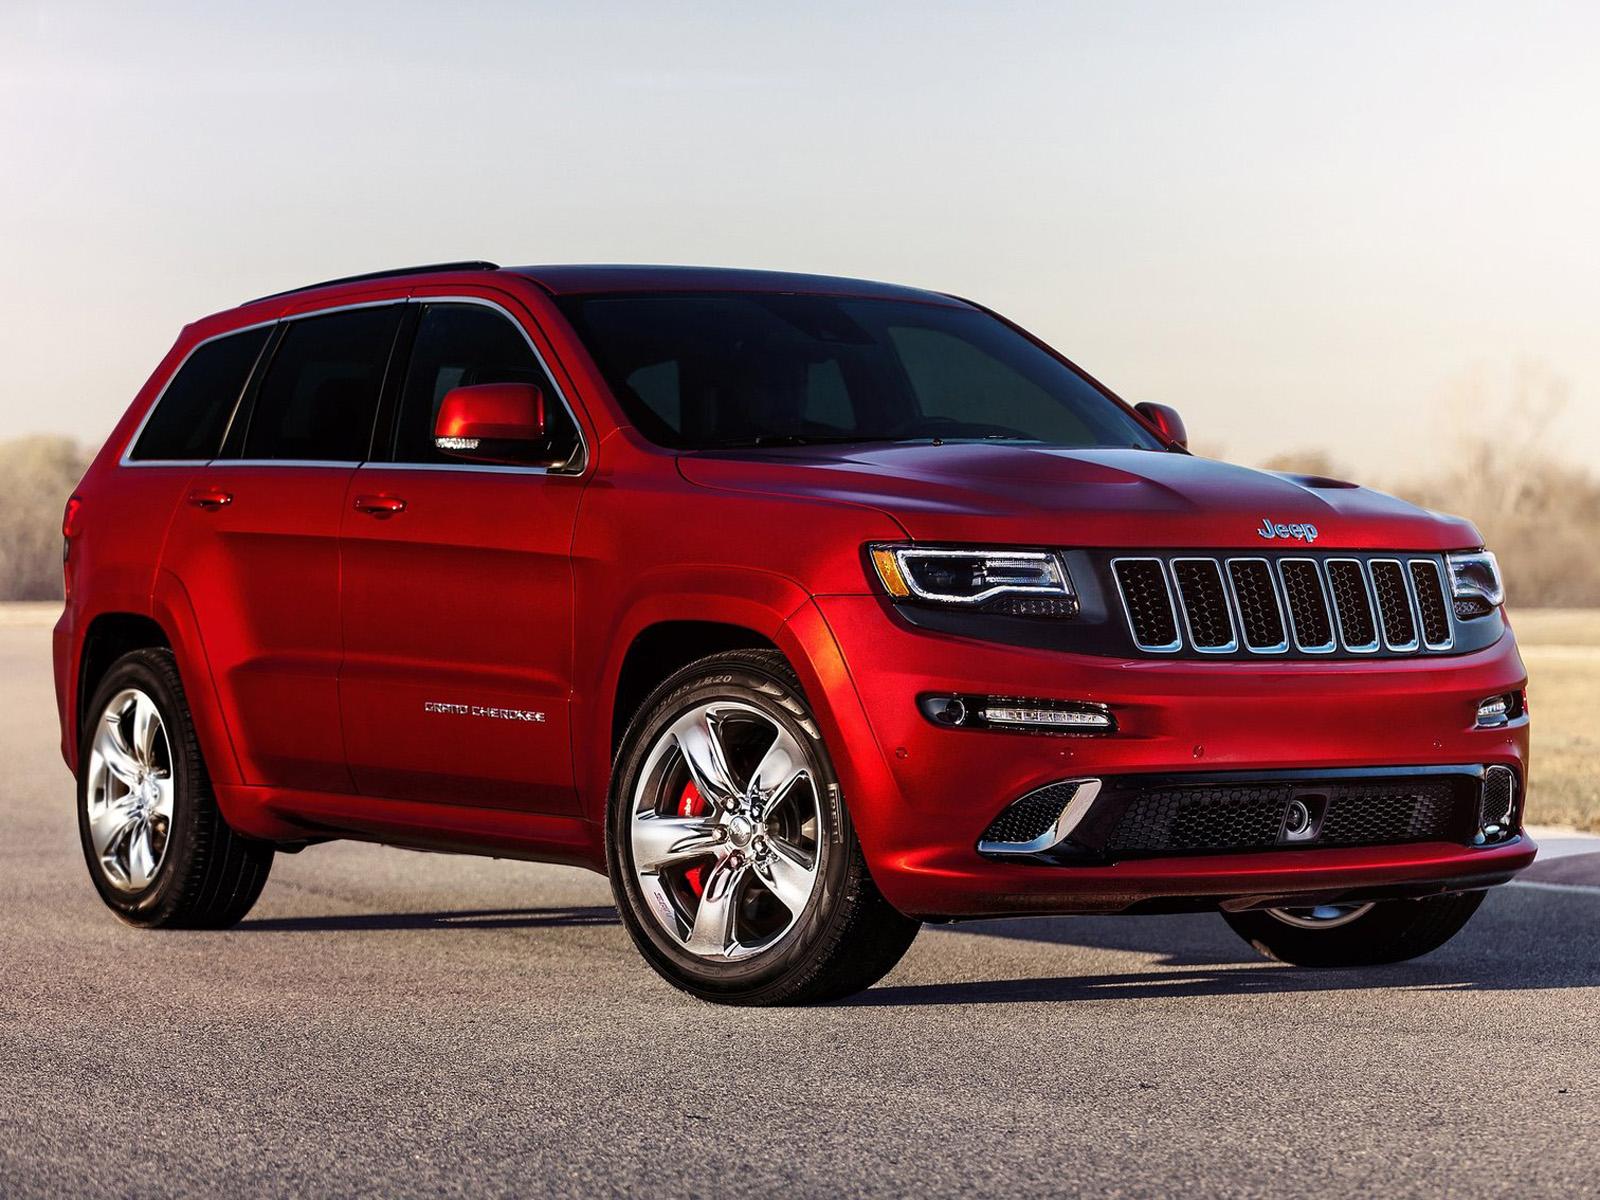 Jeep Grand Cherokee Prices